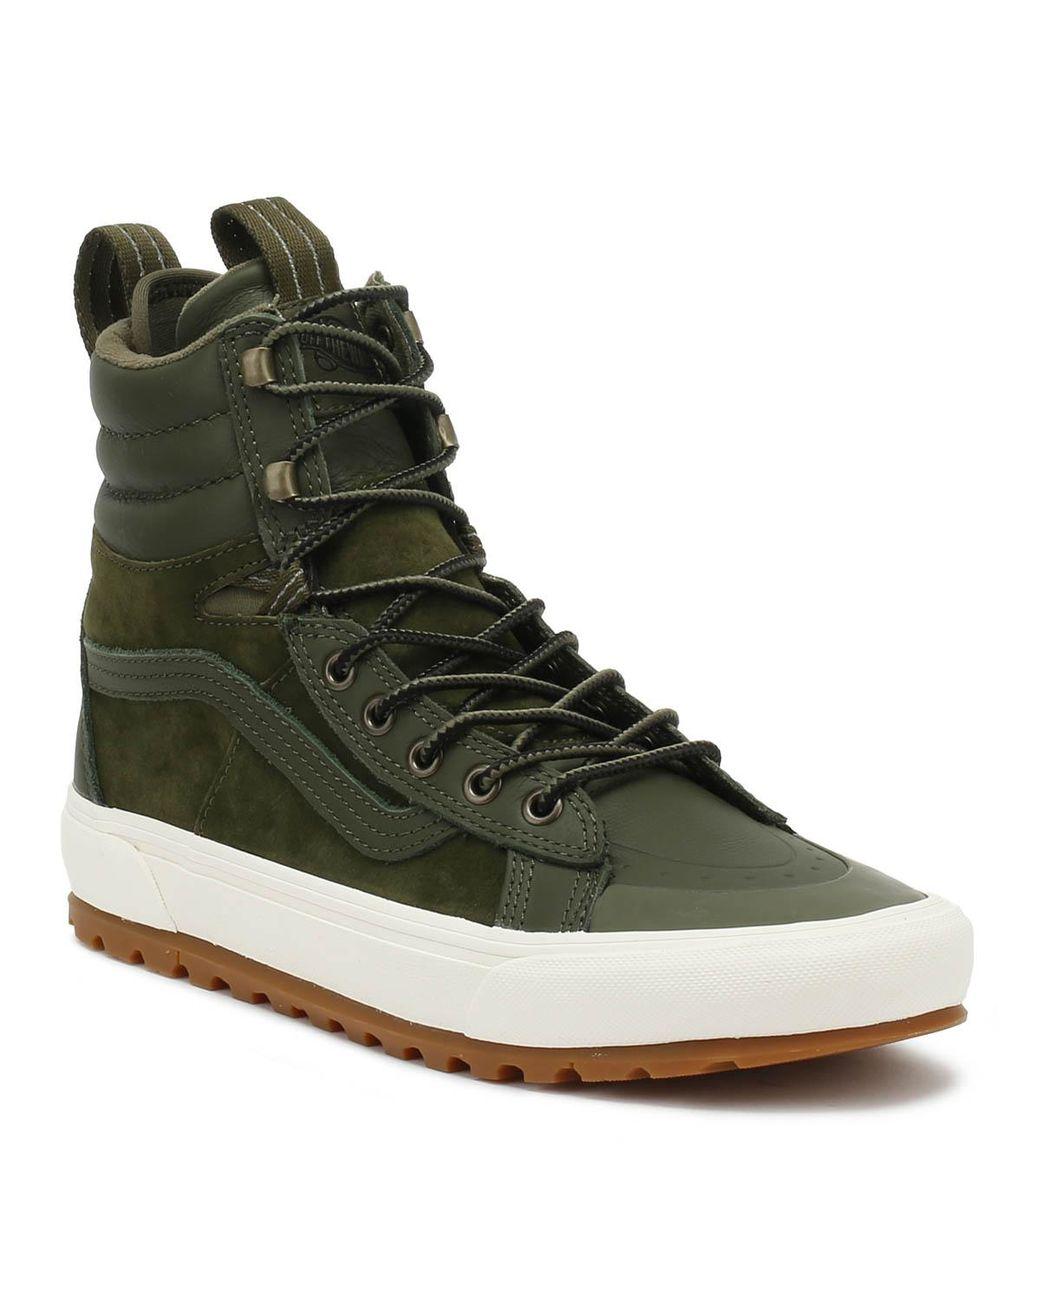 b5312a892395eb Lyst - Vans Sk8-hi Mte Dx Grape Leaf Green Boots in Green for Men